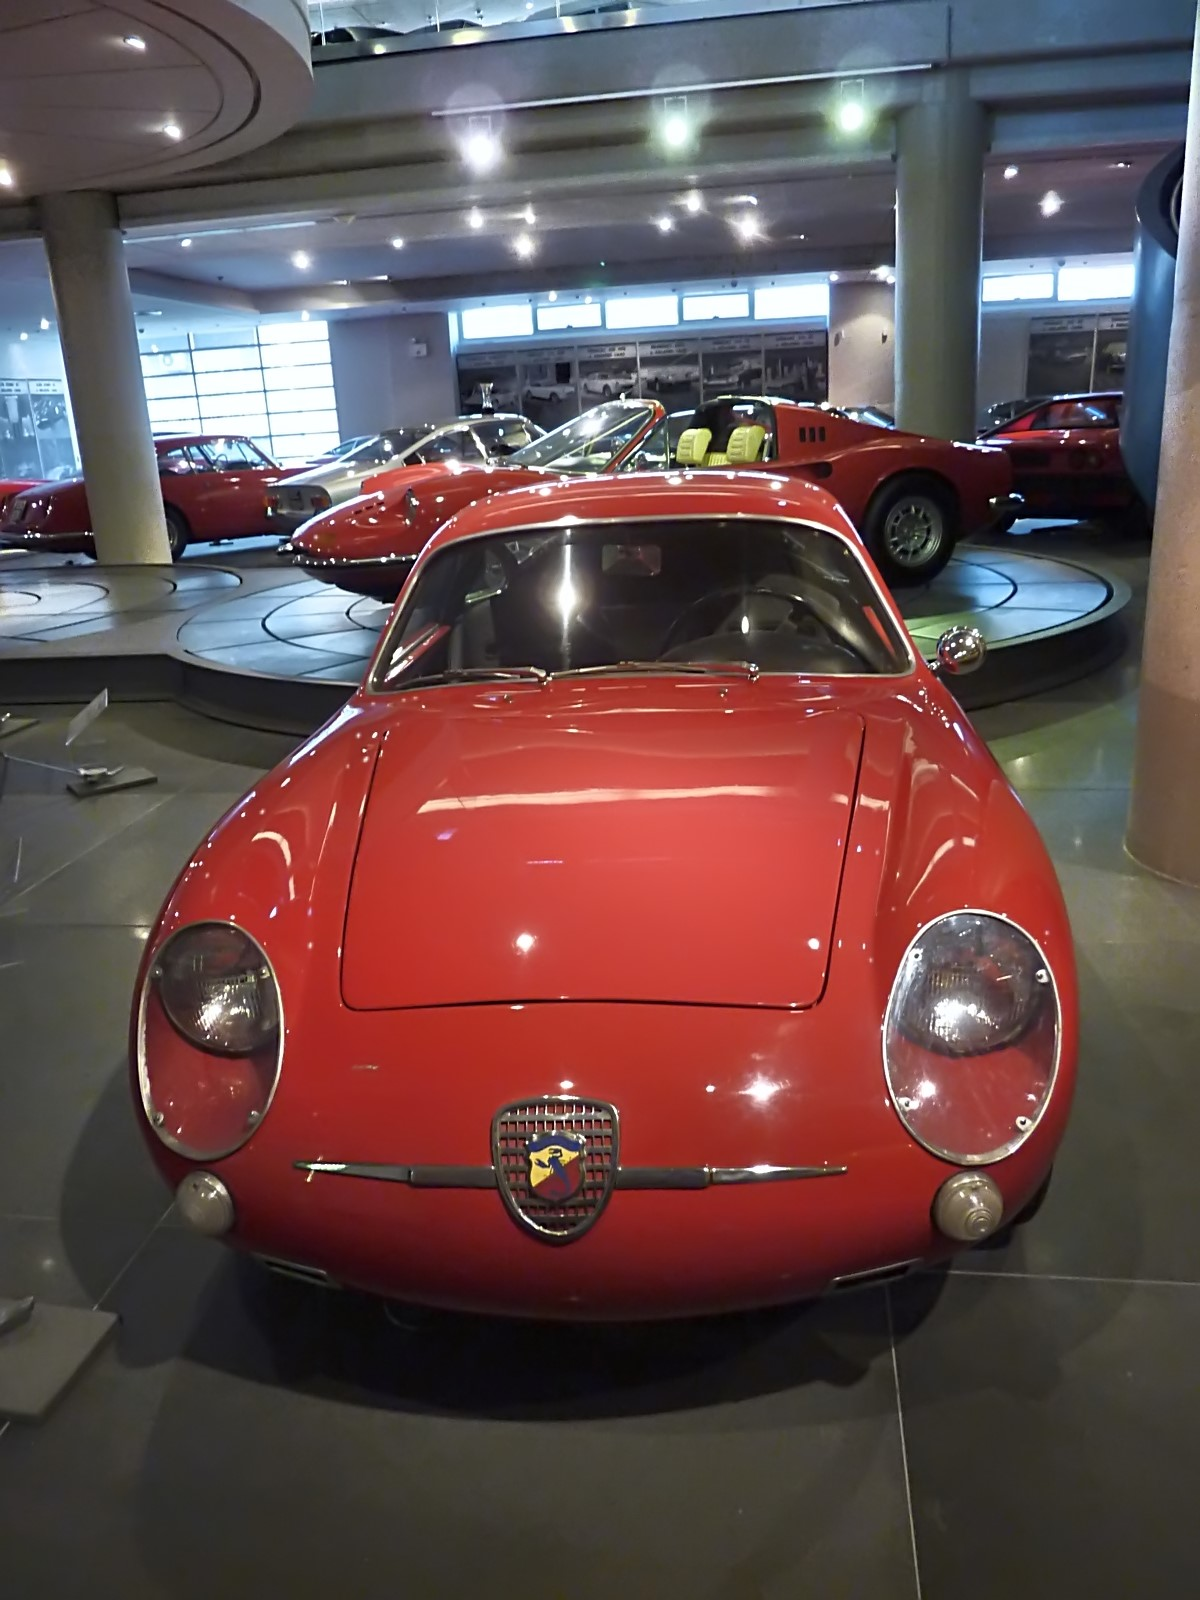 hellenic motor museum (7).JPG